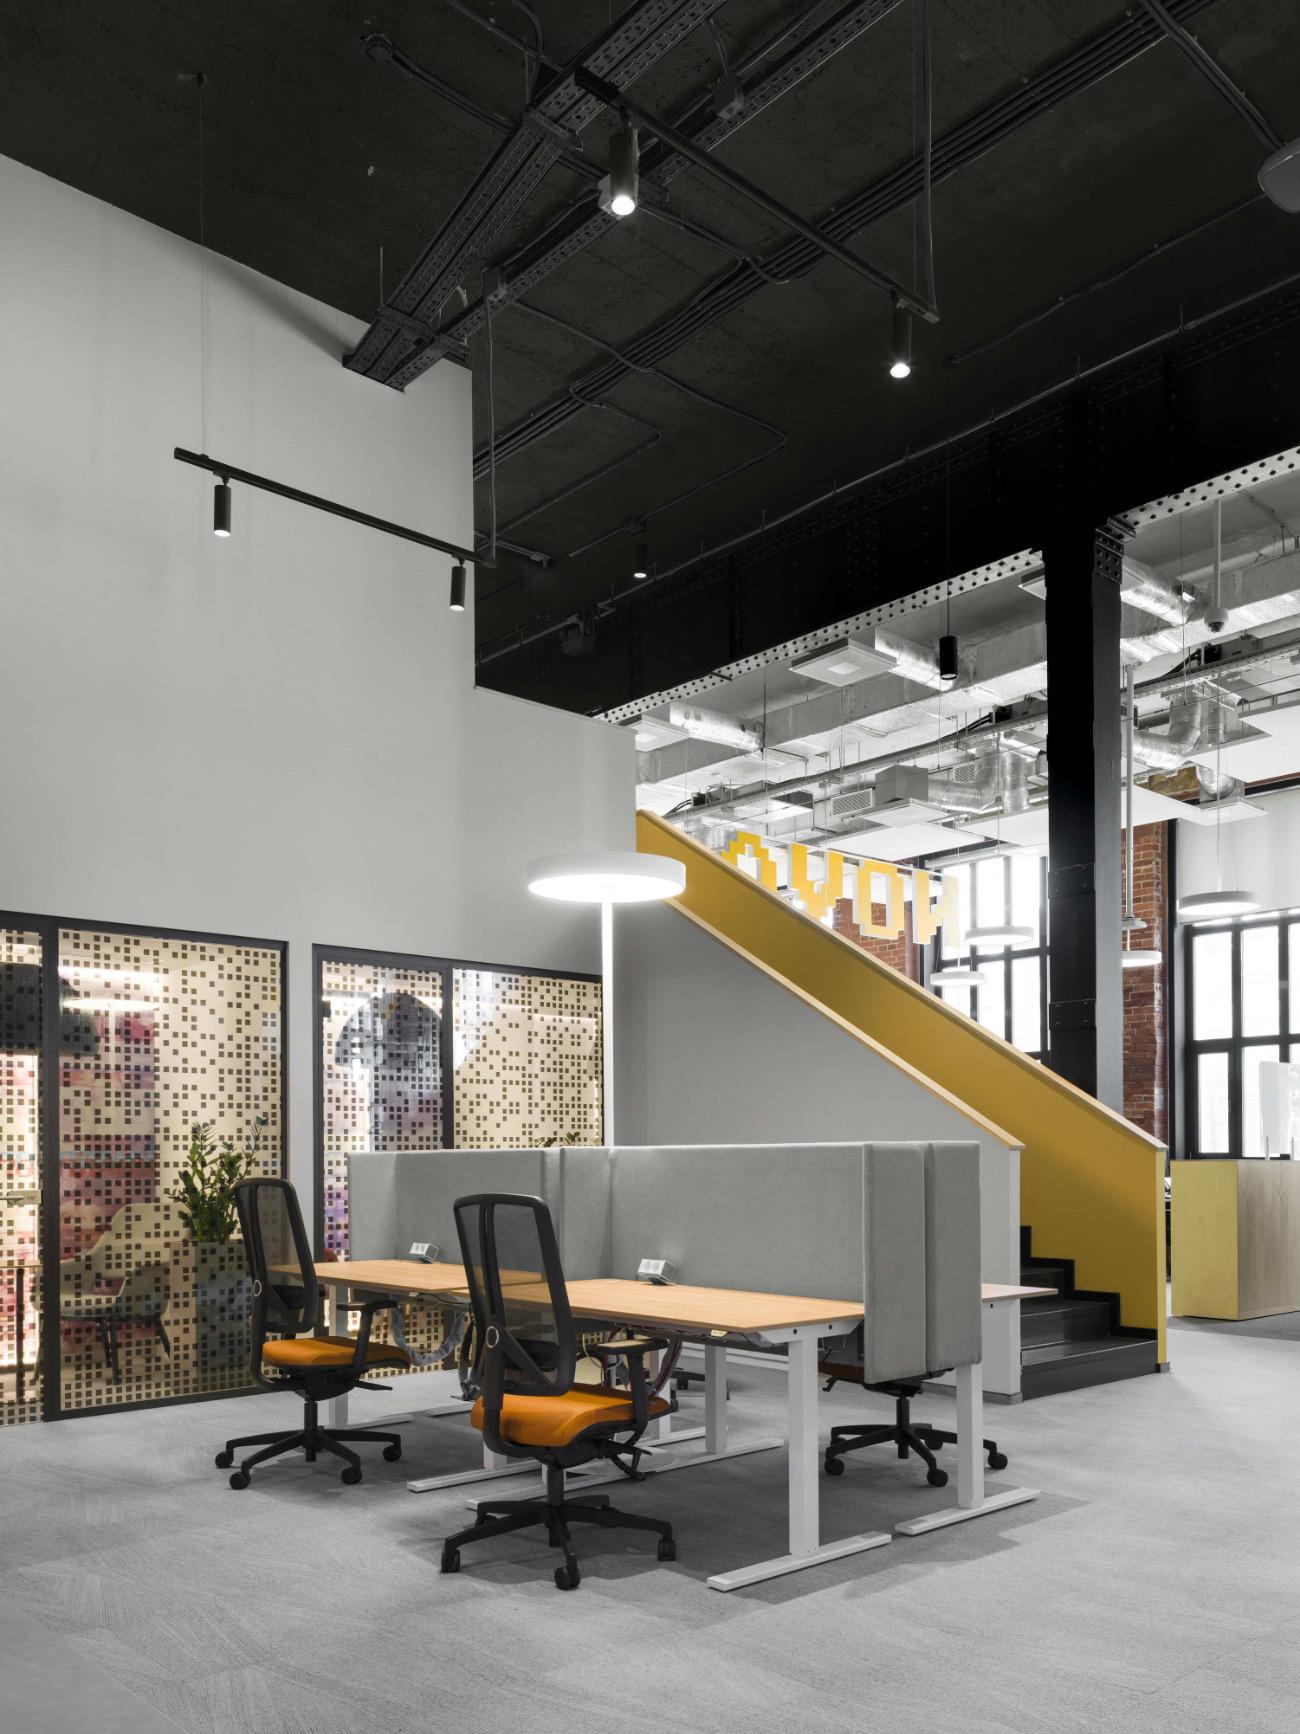 A Look Inside Raiffeisen's New Omsk Office